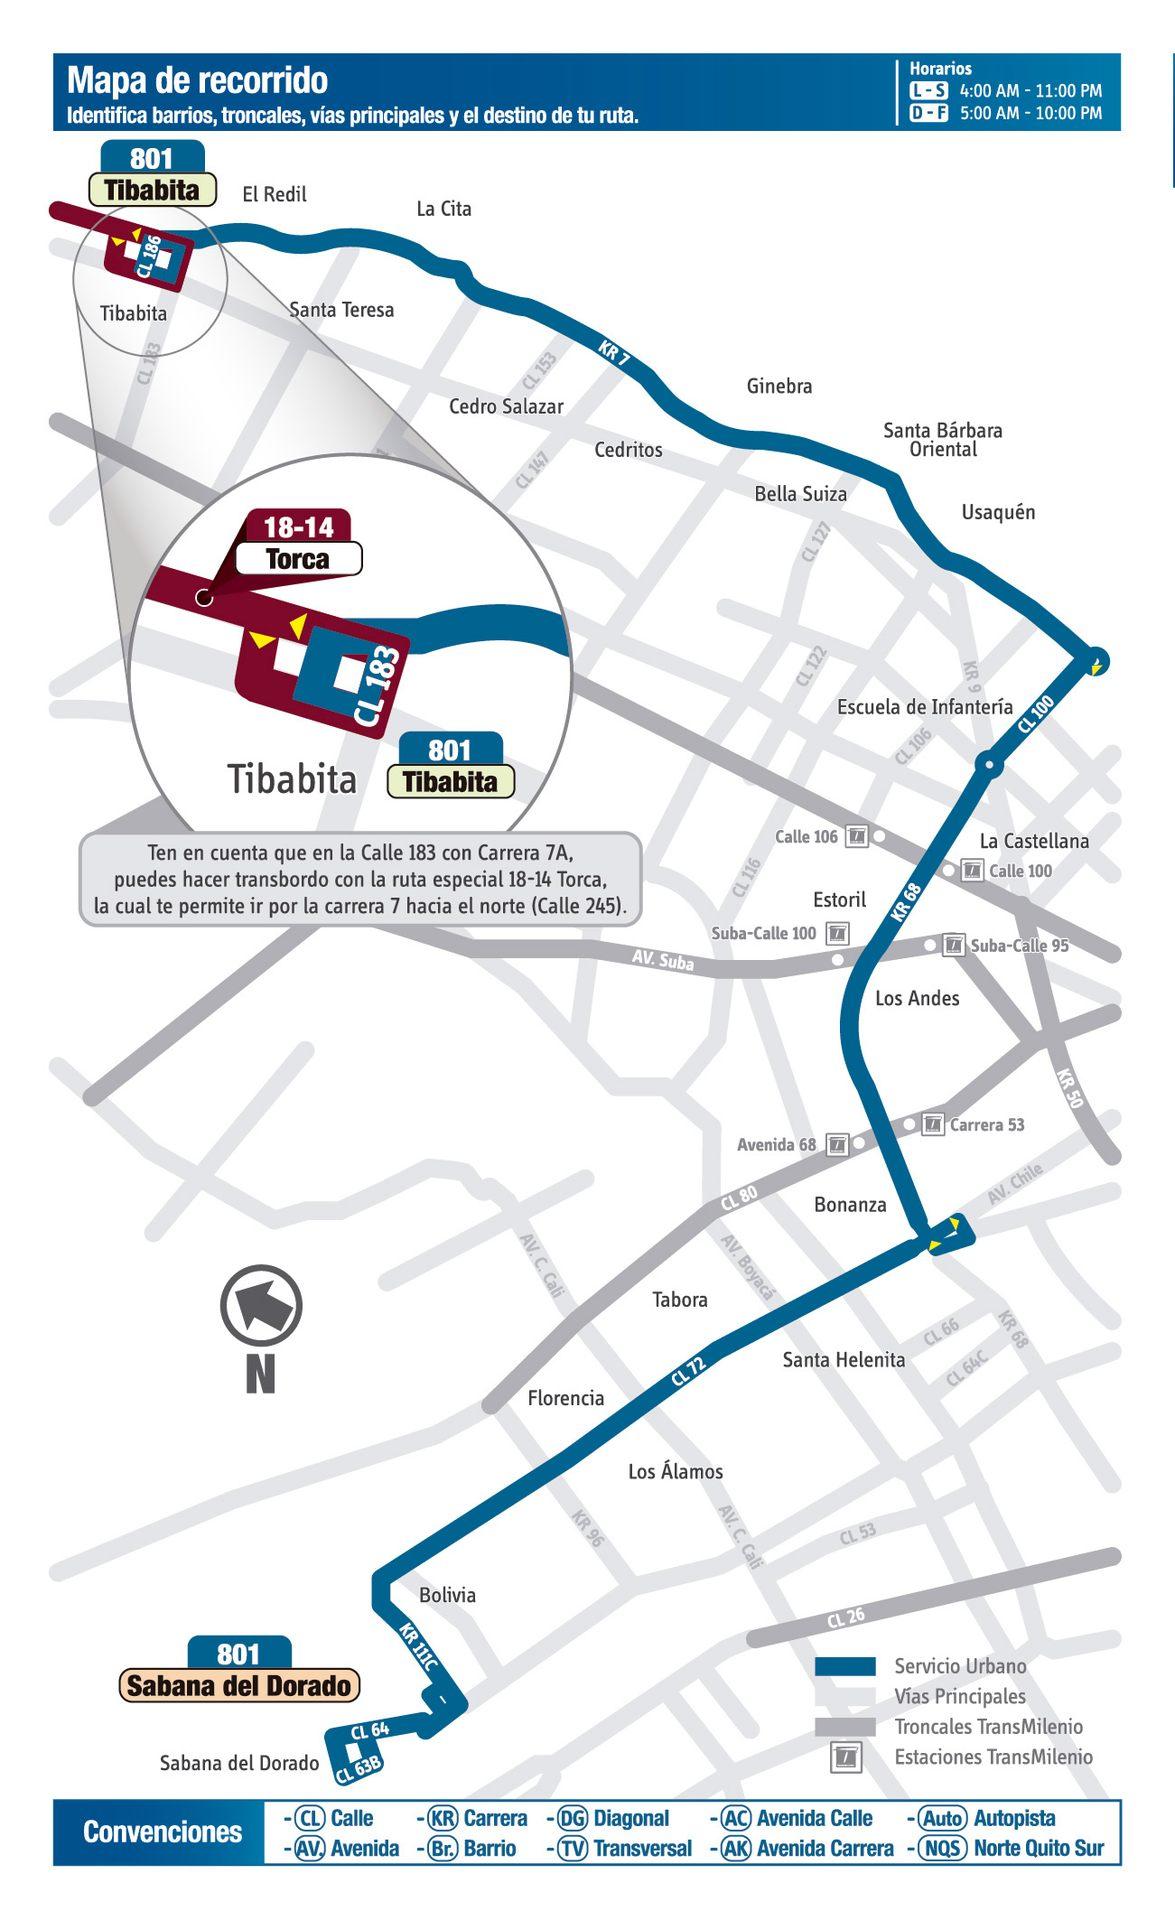 Ruta SITP: 801 Sabana del Dorado ↔ Torca [Urbana] 4